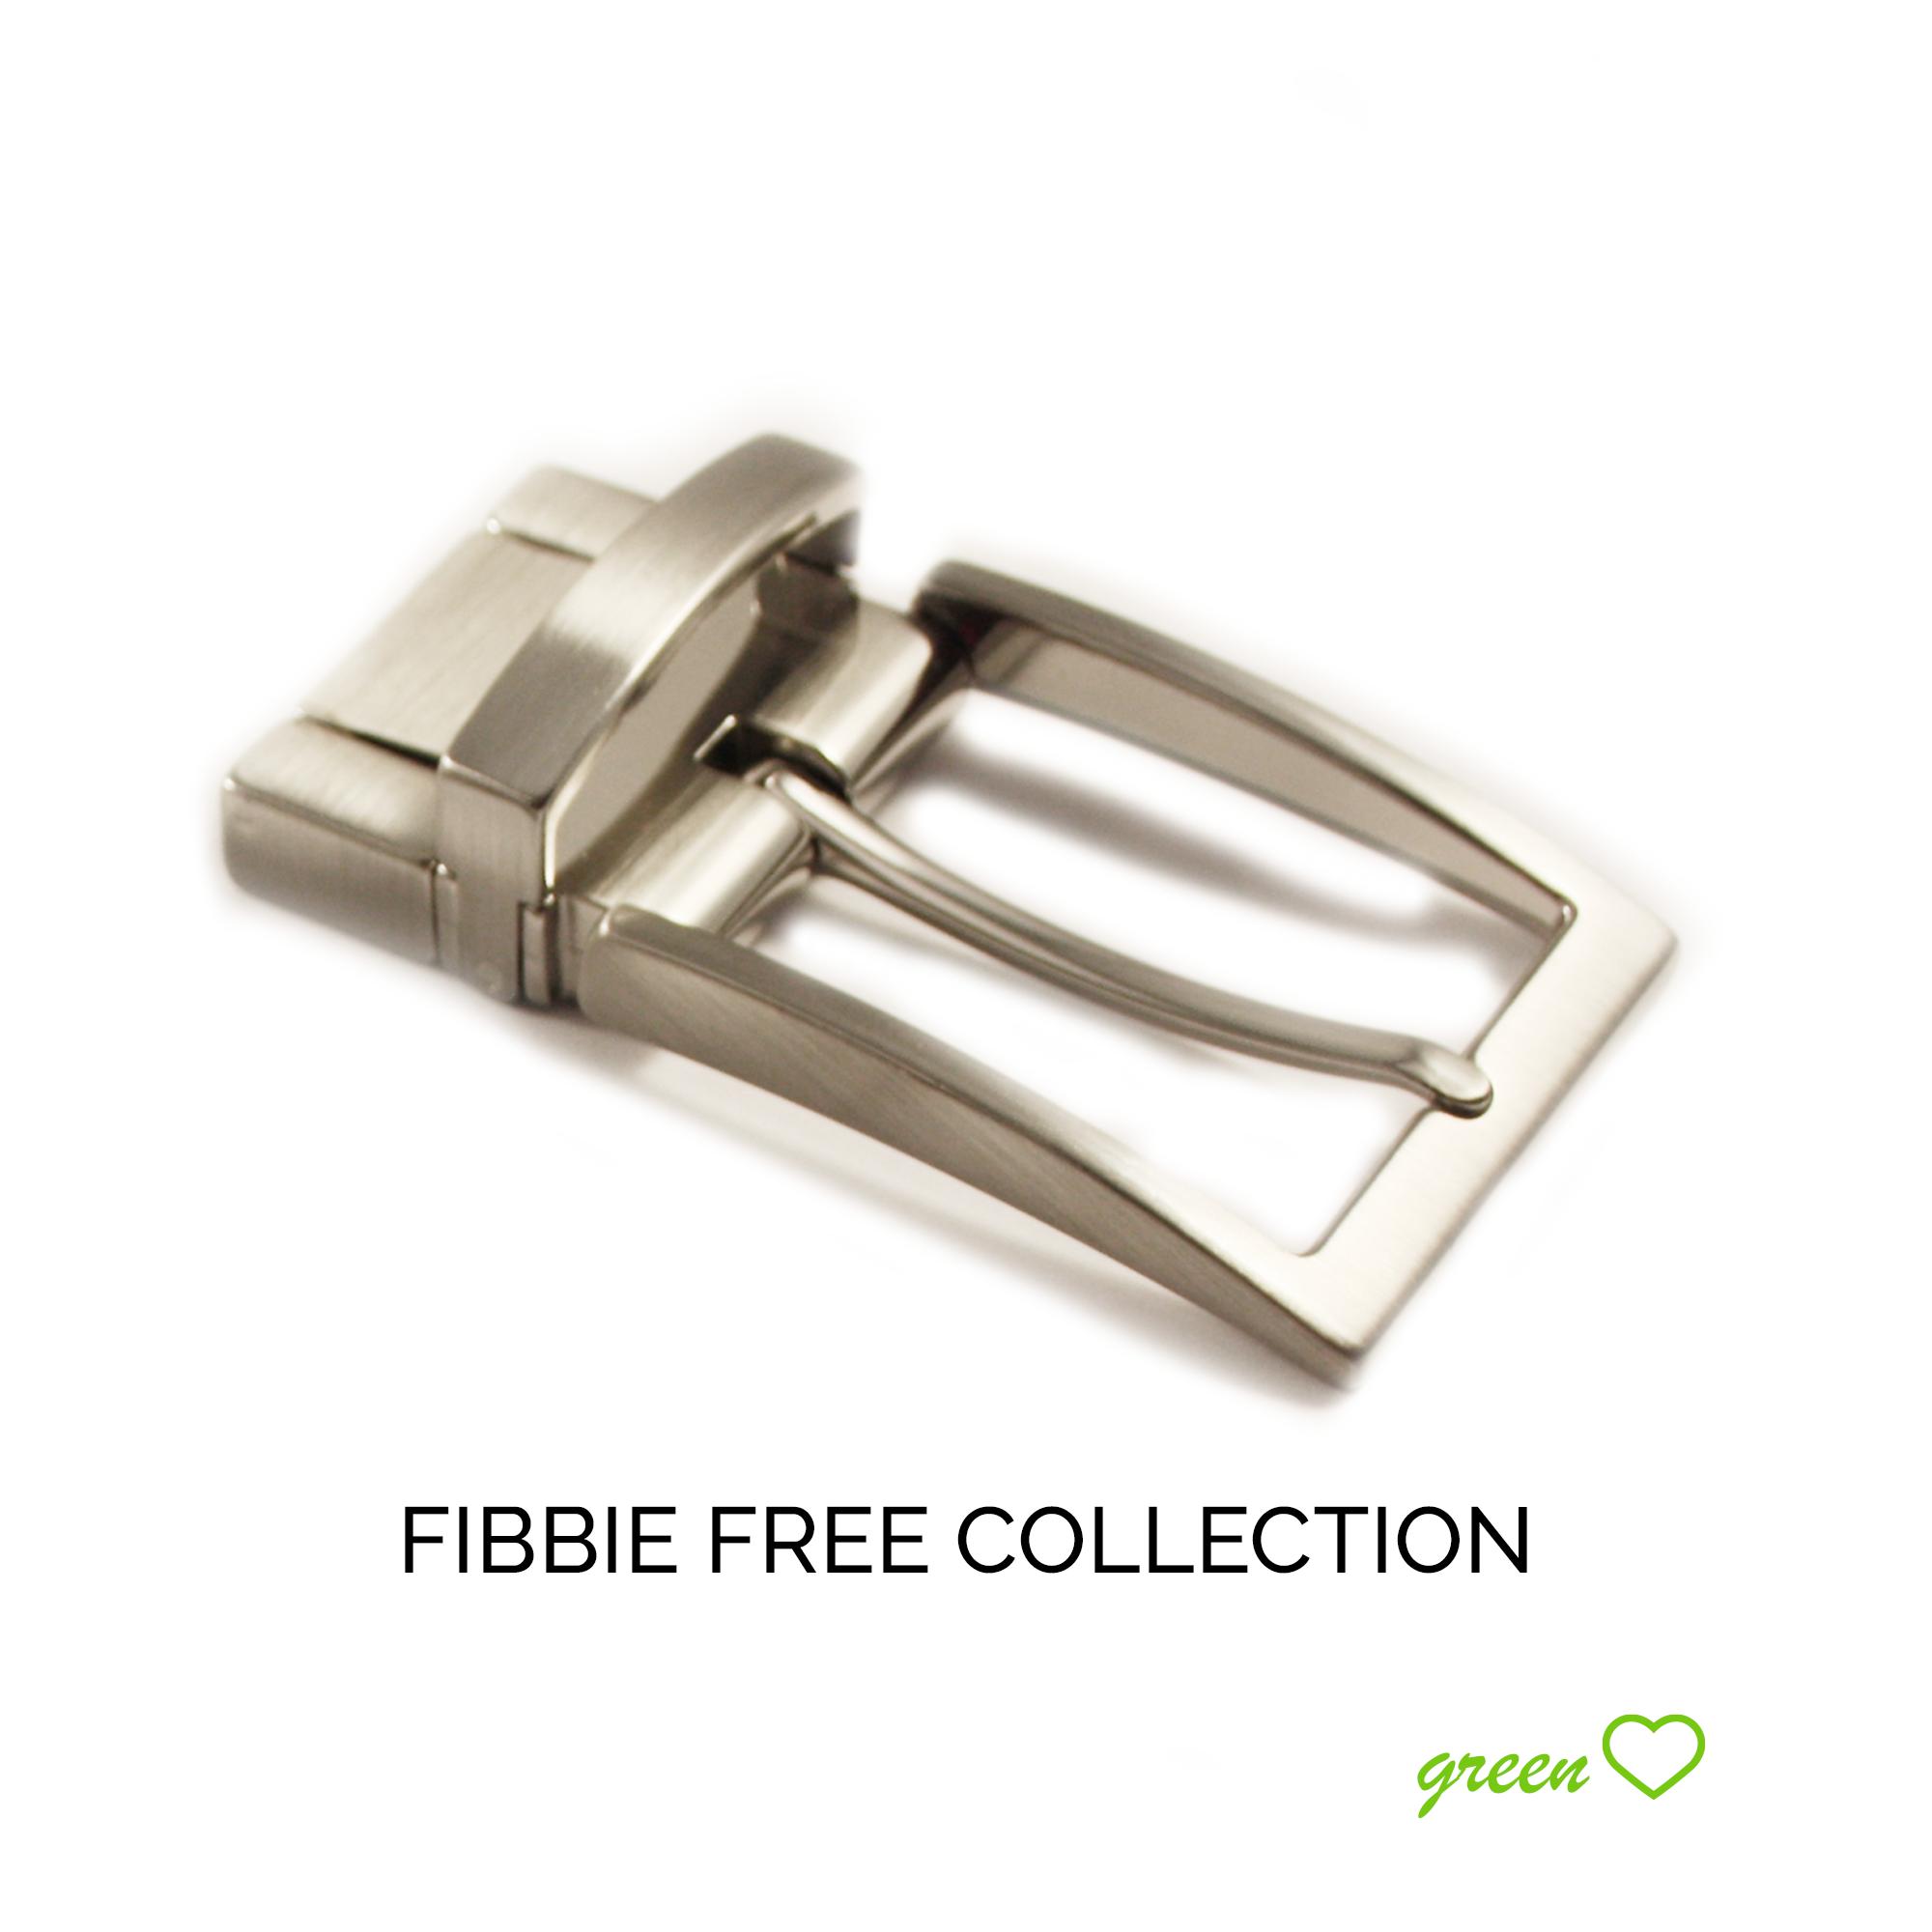 Fibbie free collection senza nichel e senza piombo - Guimer